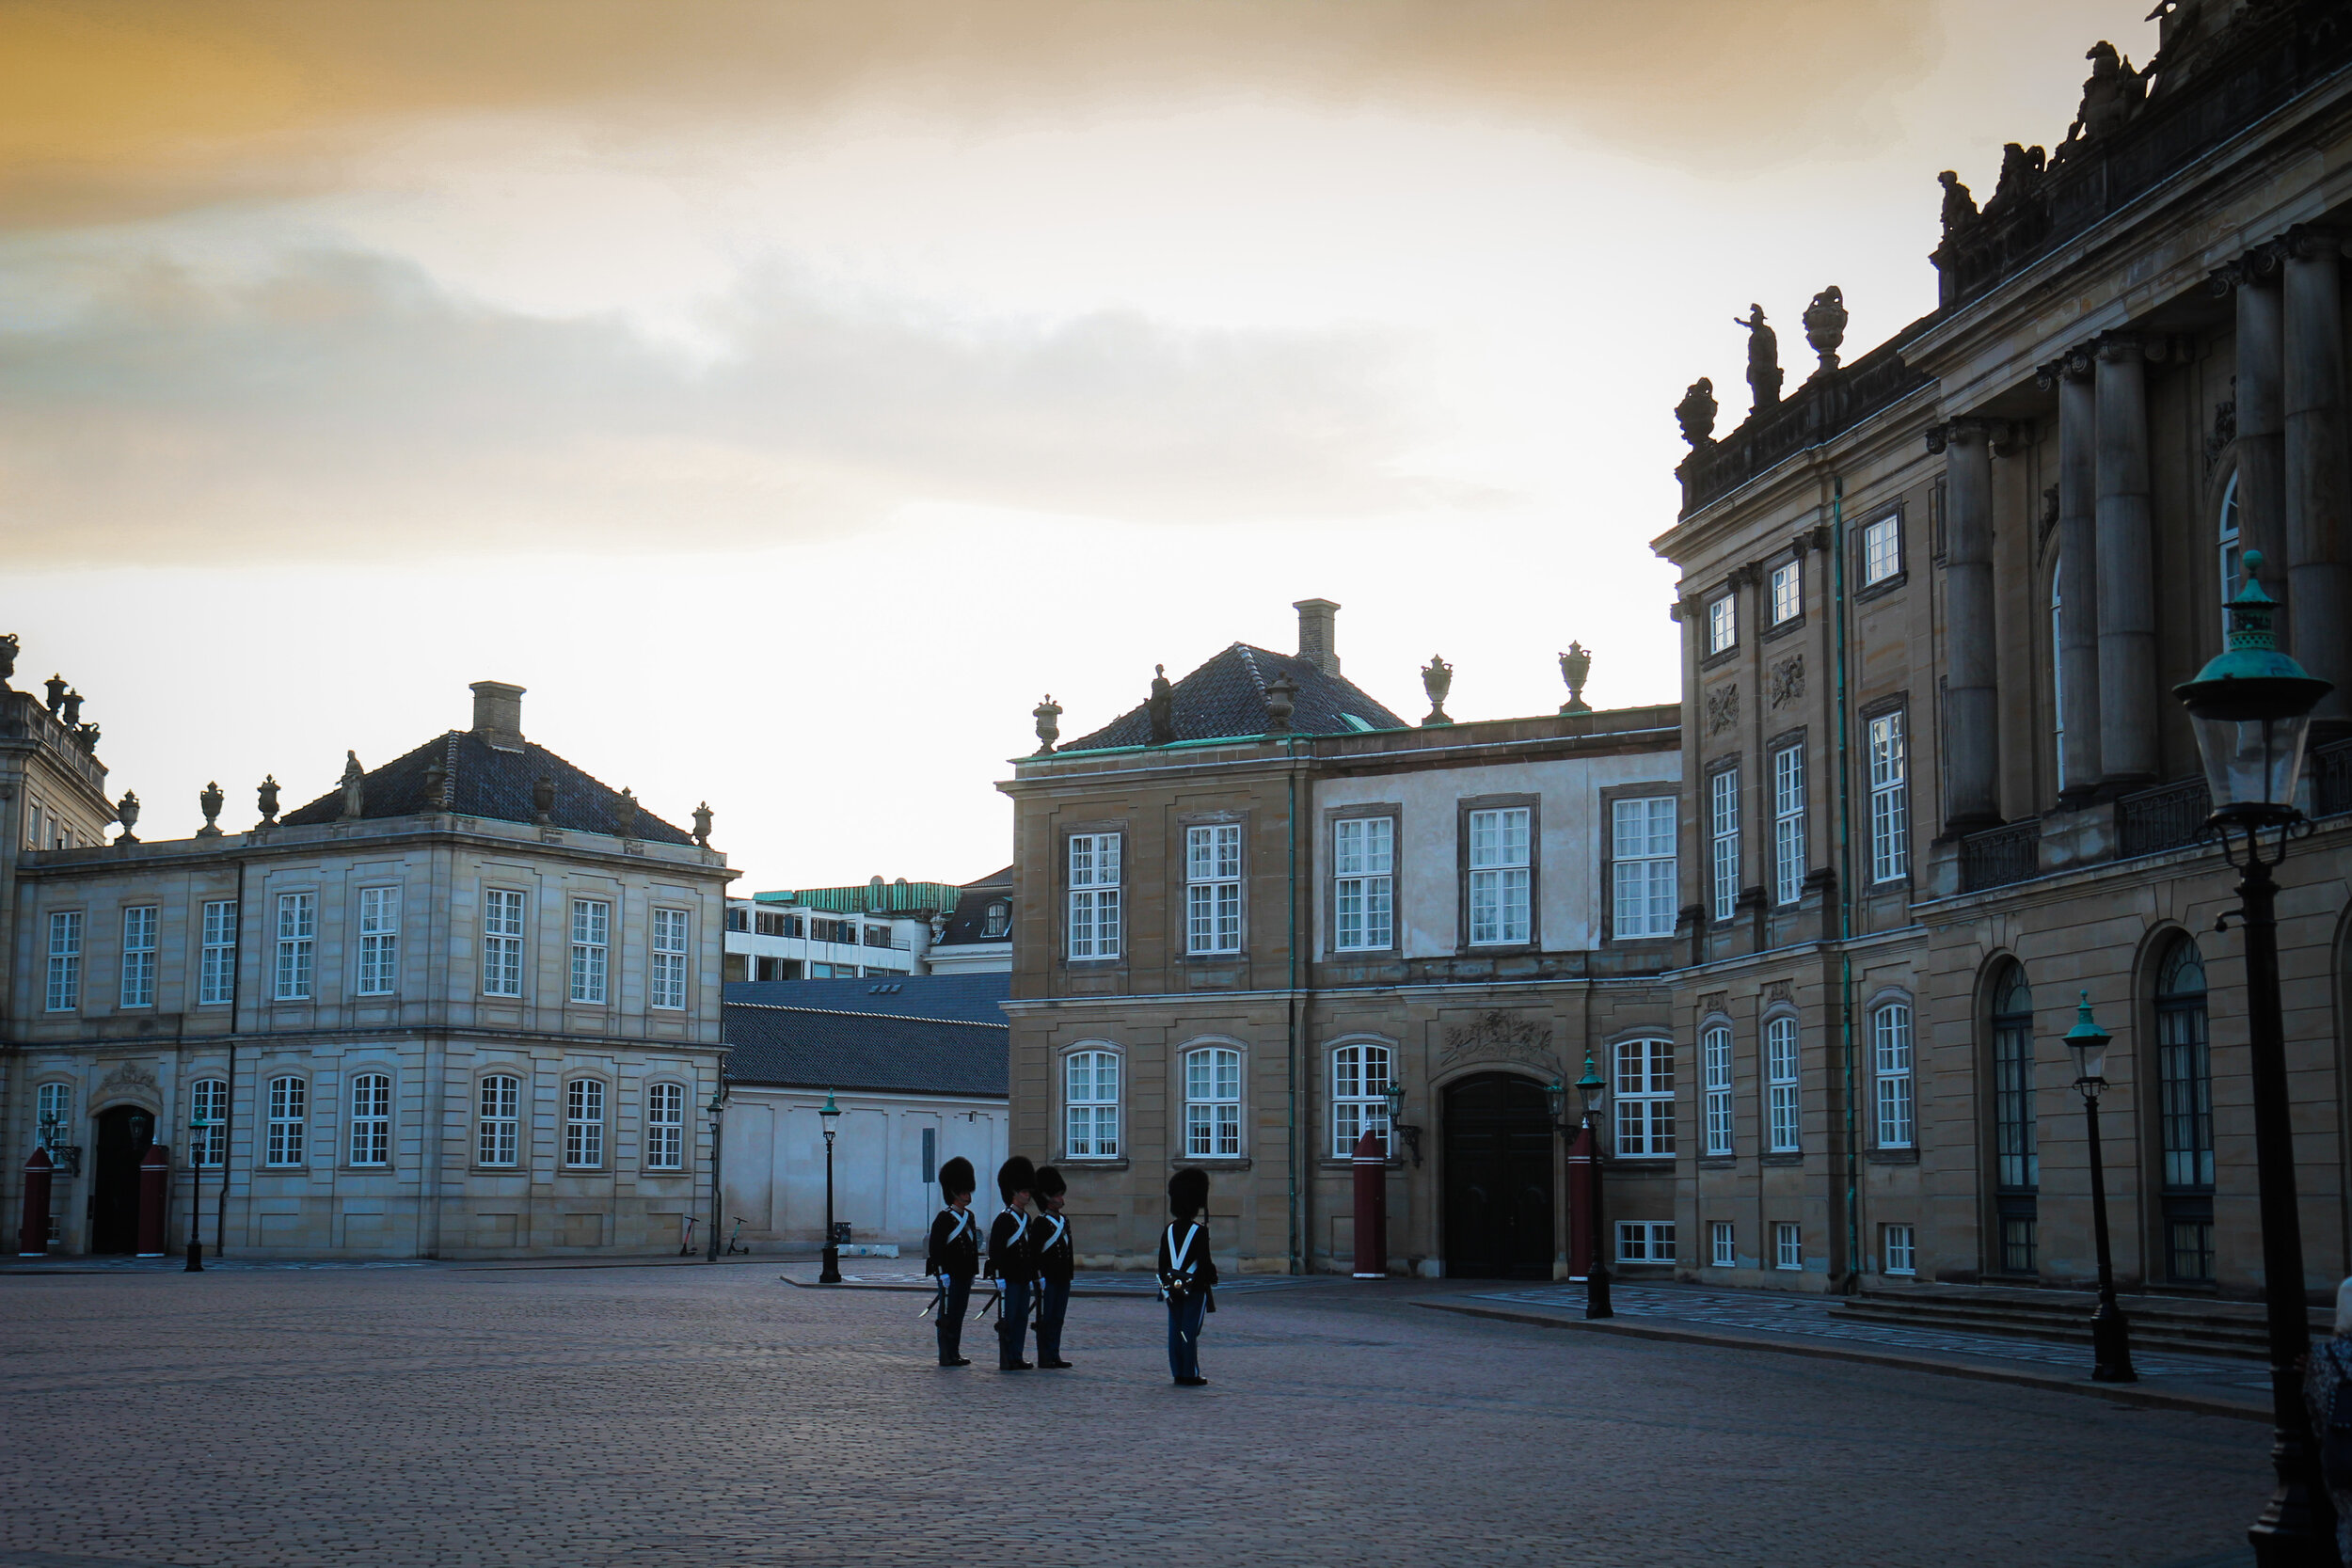 Kopenhagen_denemarken_Tui-117.jpg